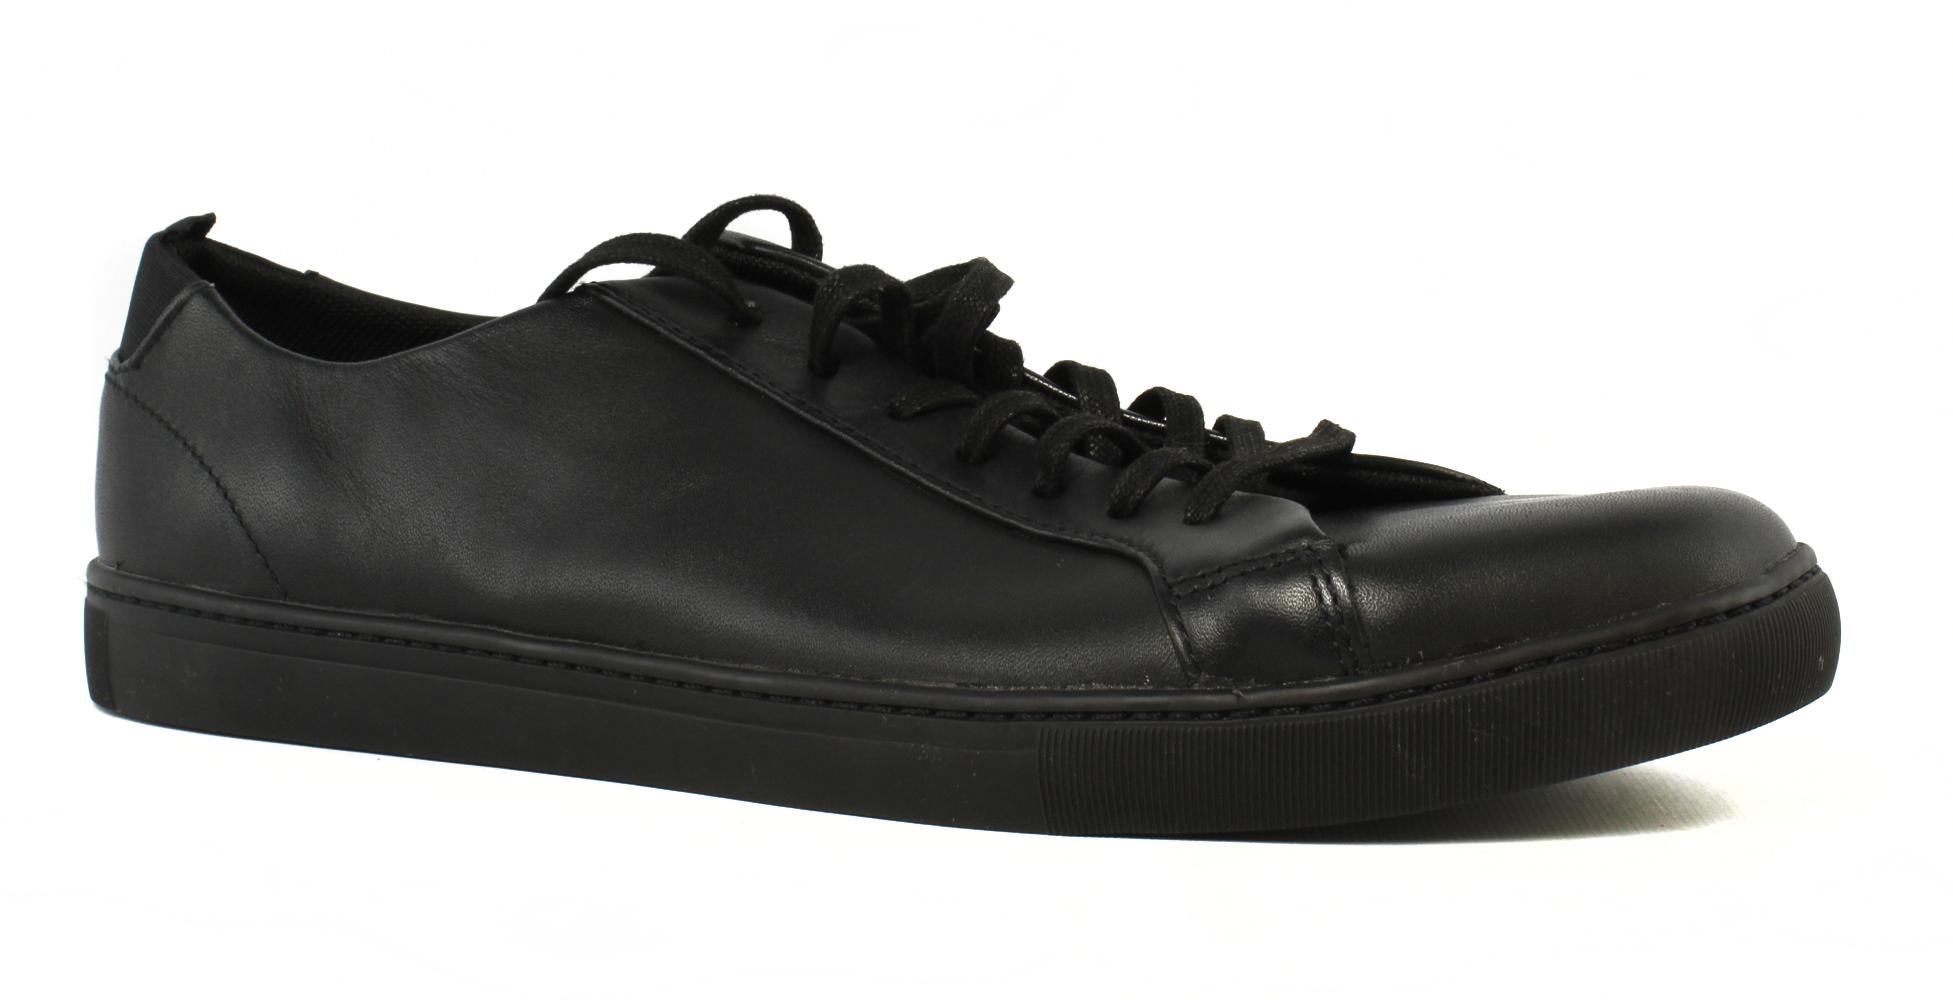 db1ecefa2fe Details about The Rail Mens Black Fashion Shoes Size 13 (341258)